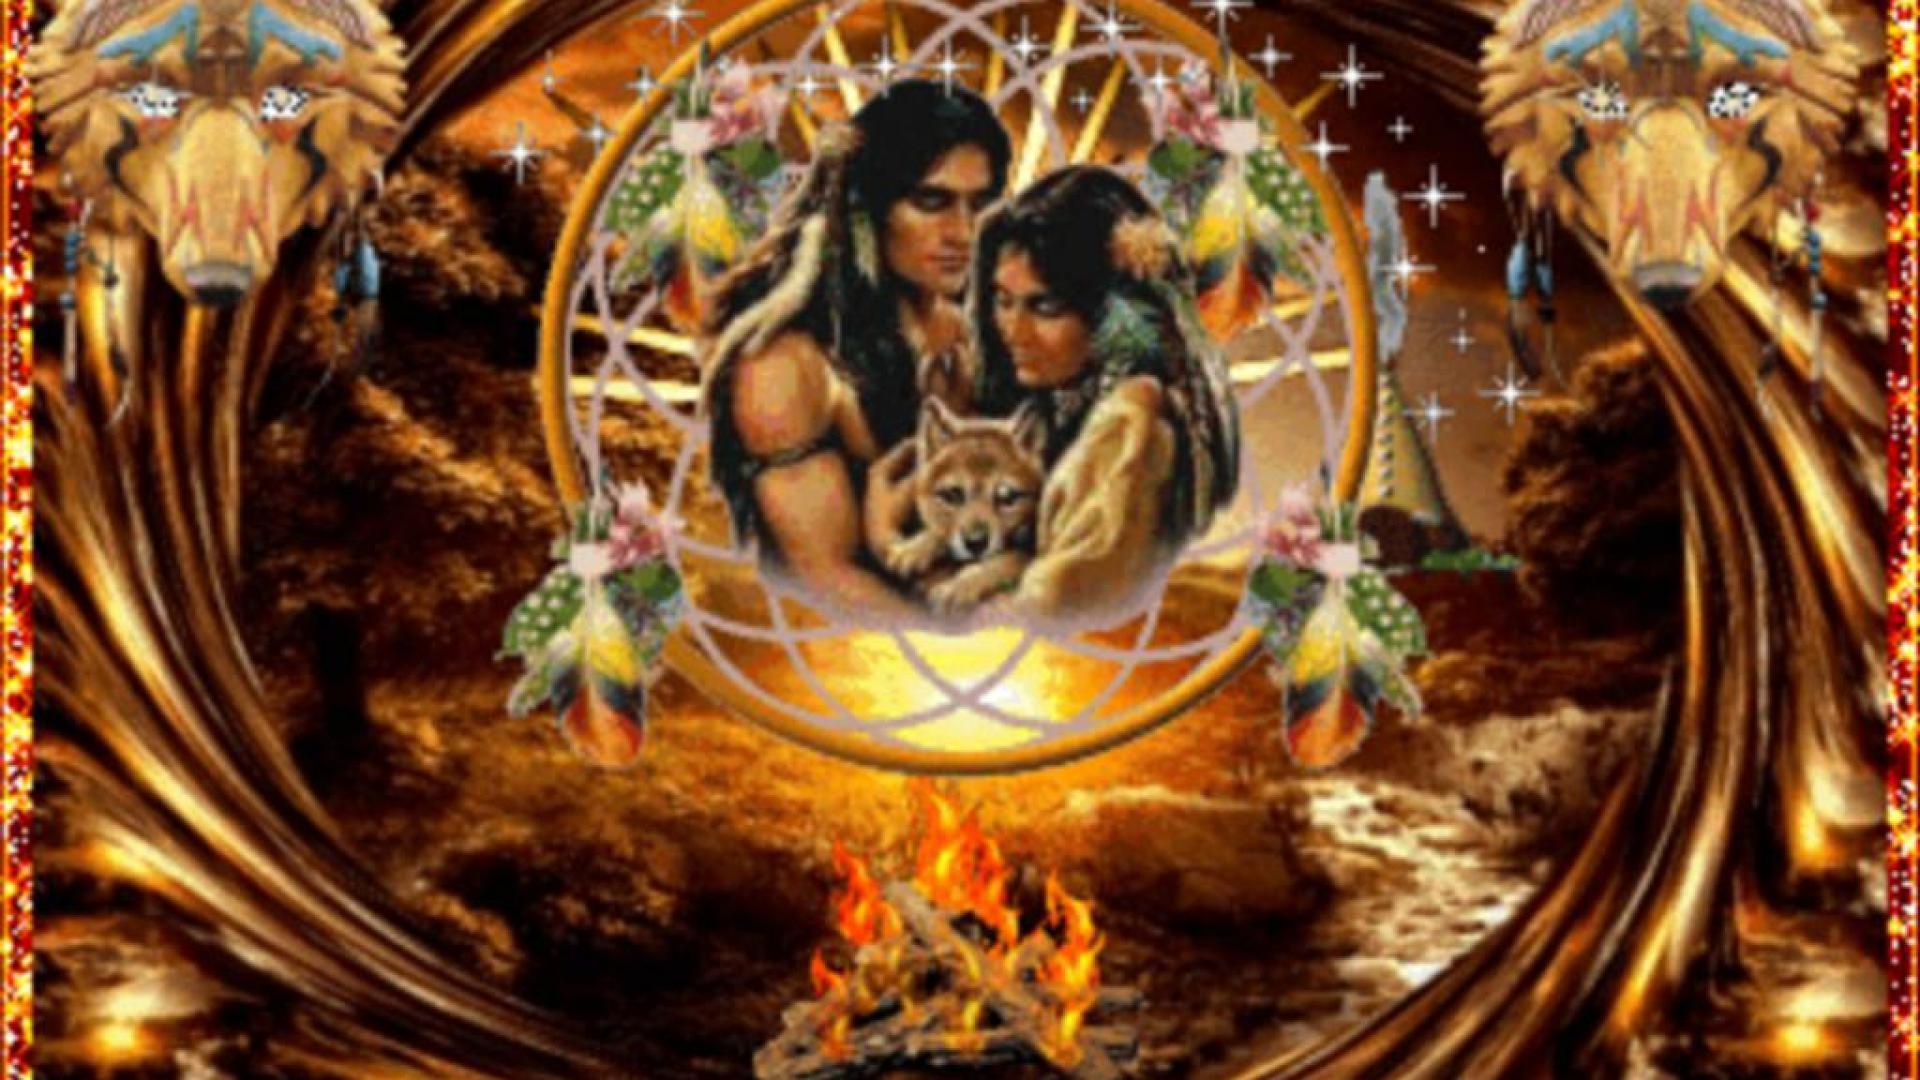 Native American Spiritual Wallpapers - Top Free Native American